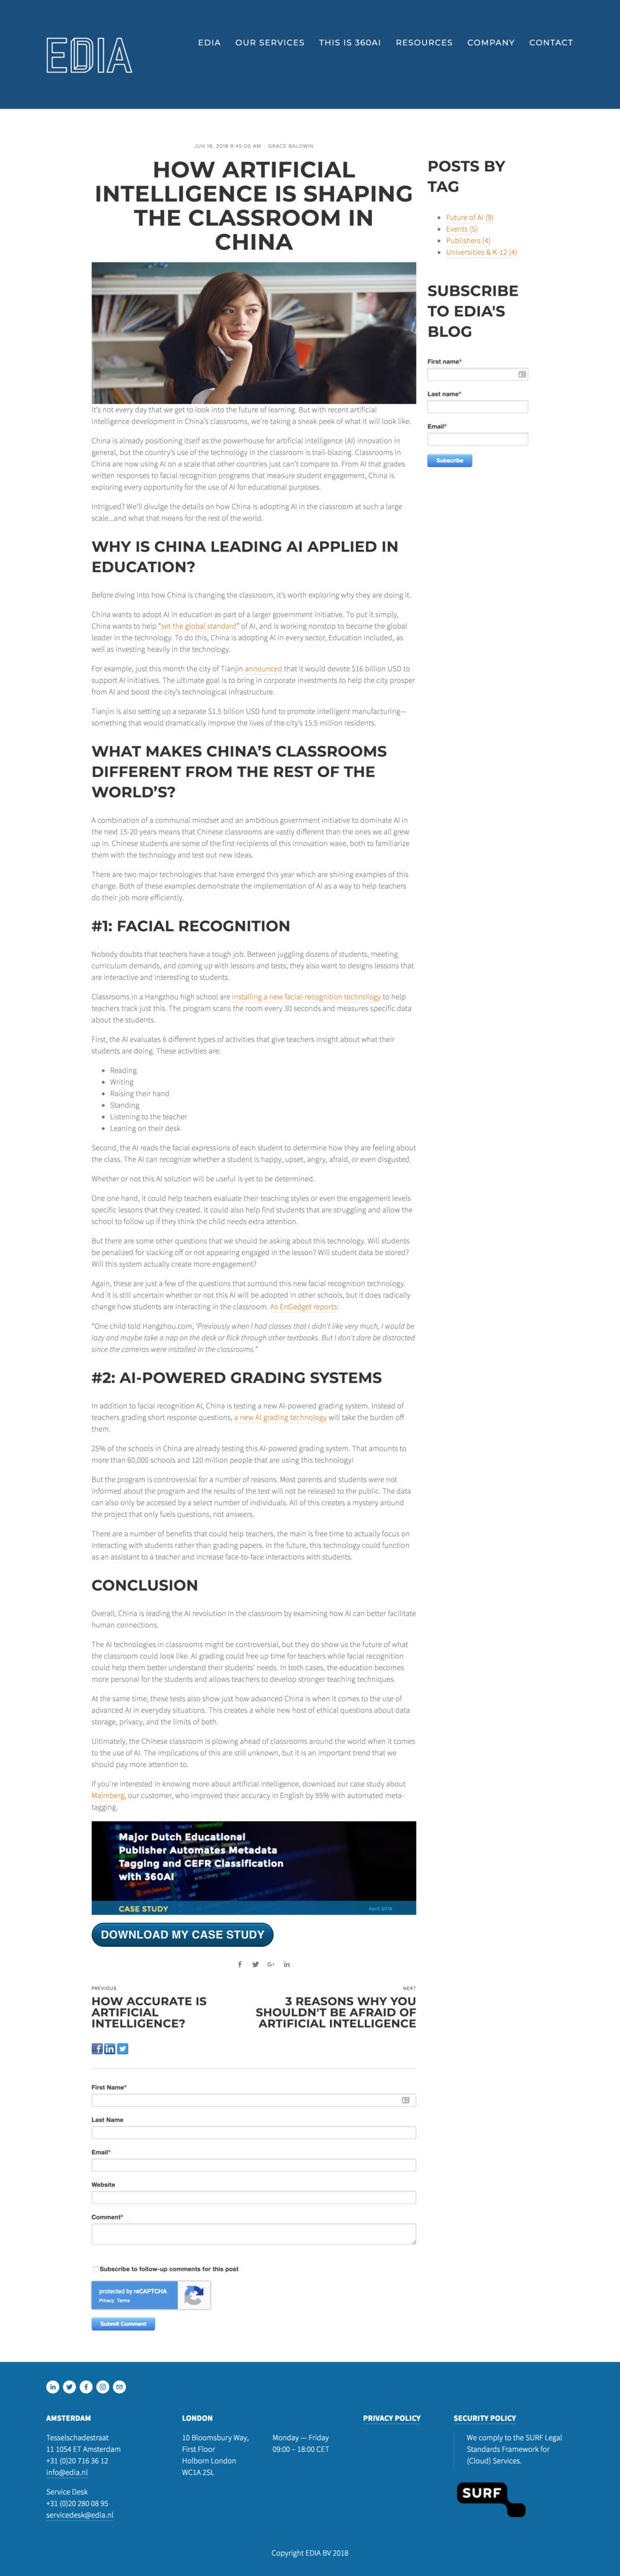 screencapture-blog-edia-nl-artificial-intelligence-shaping-classroom-china-2018-07-25-20_31_04.png